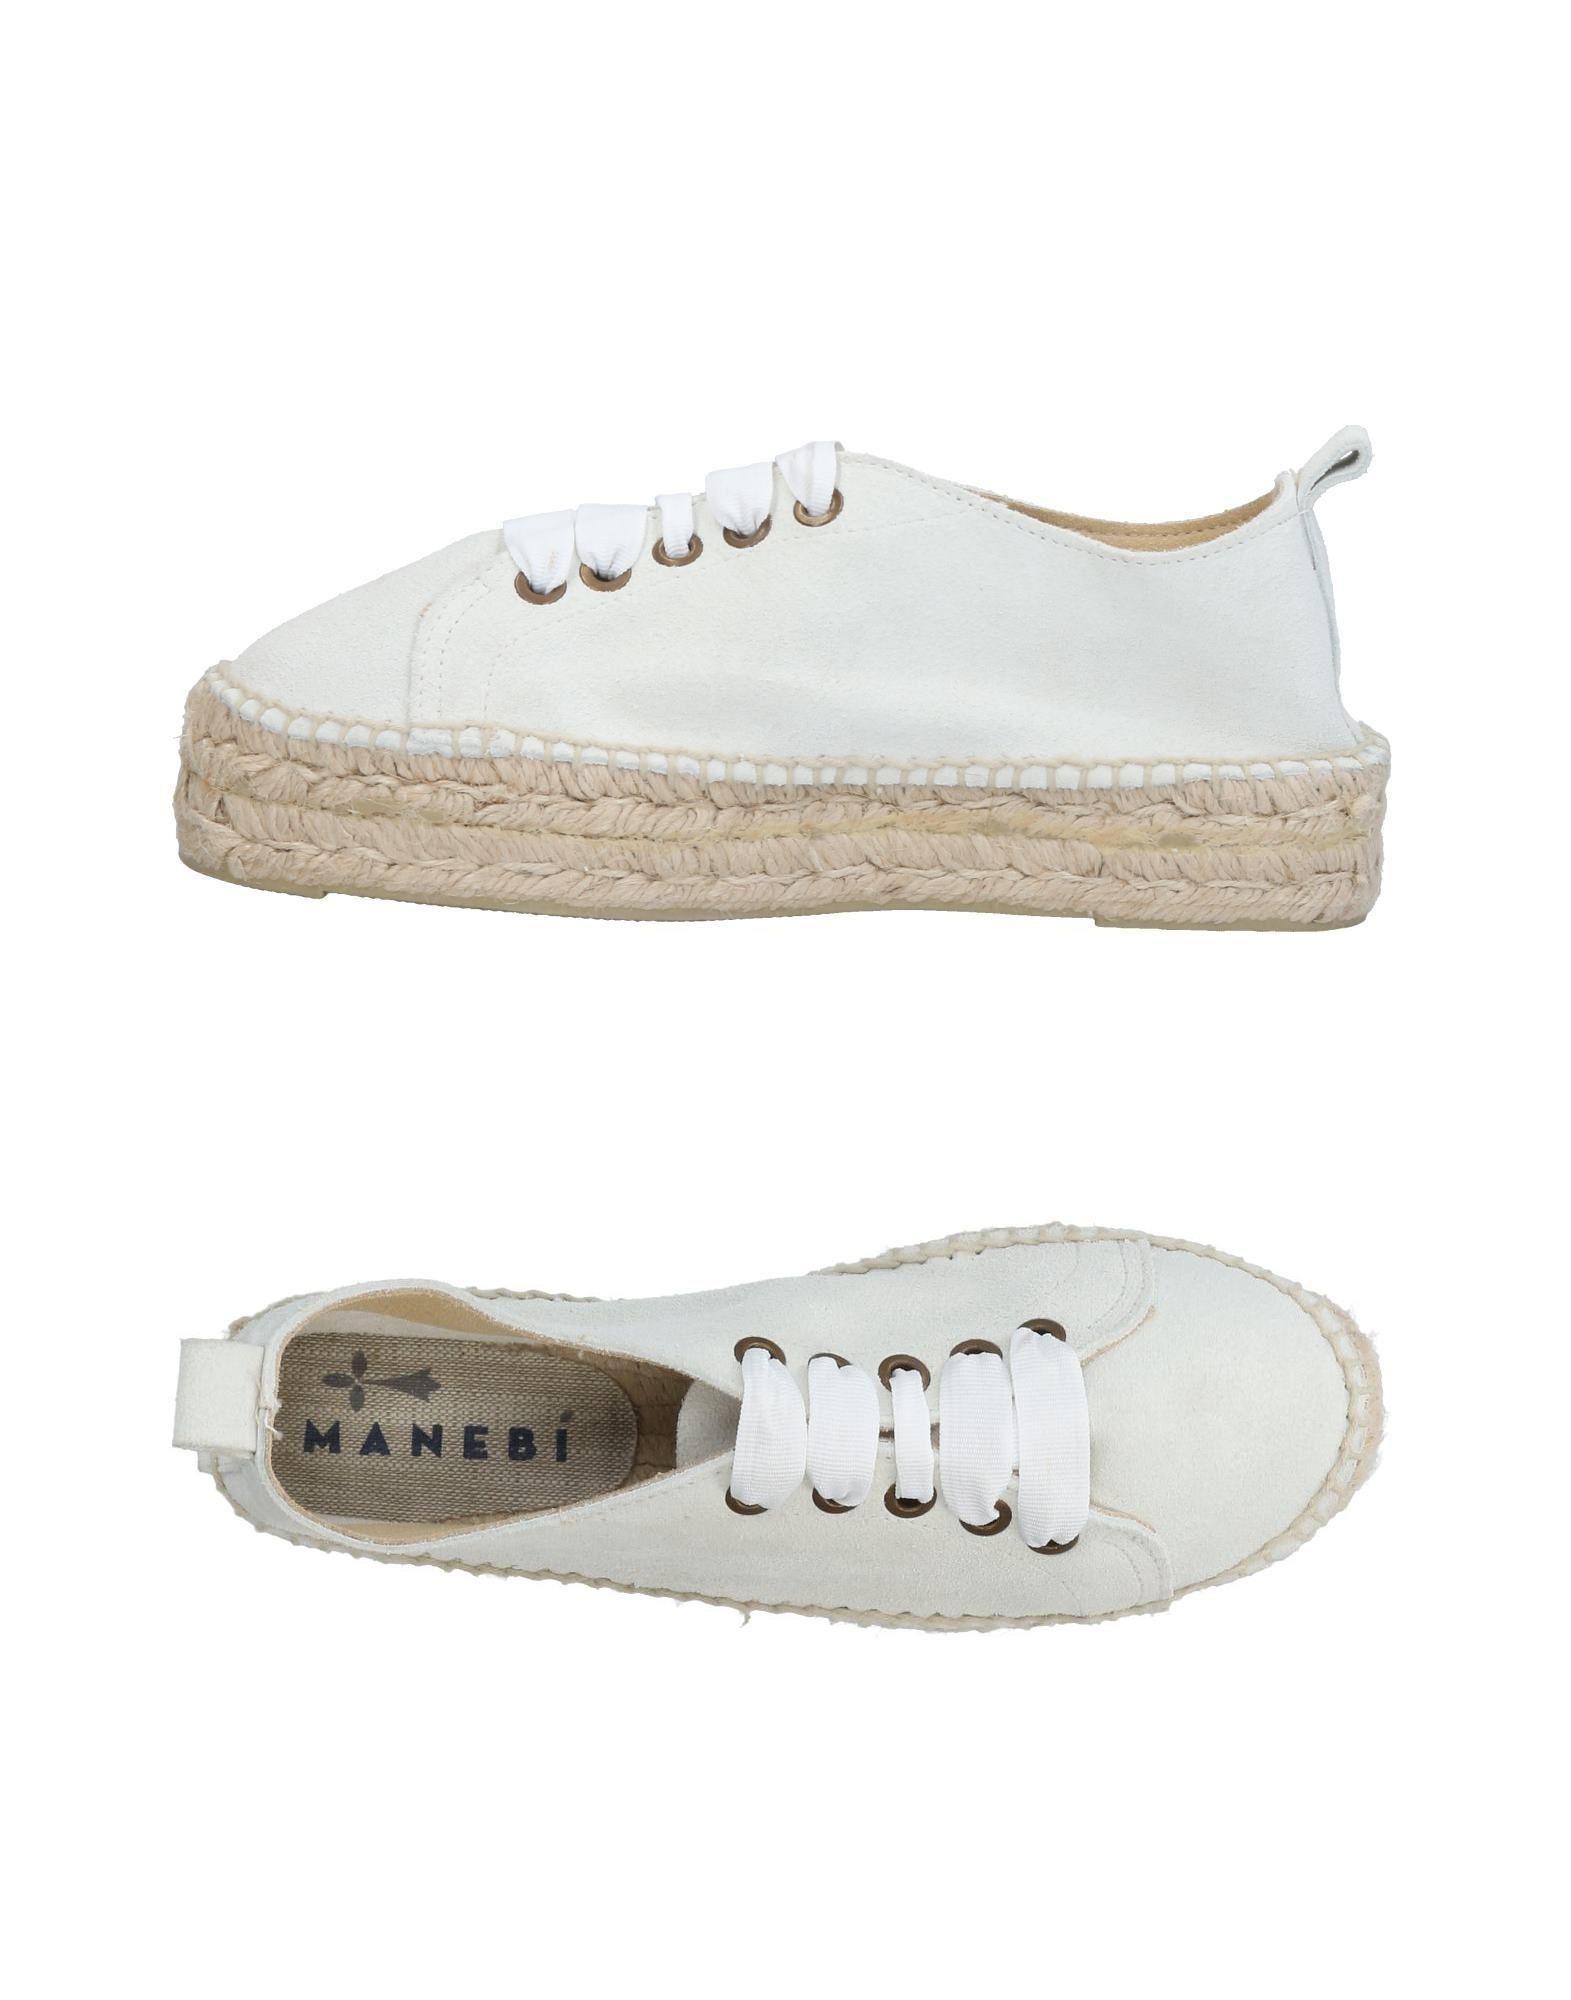 Blanc Sneakers amp; Tennis En Coloris Manebí Basses Lyst 0dpx40